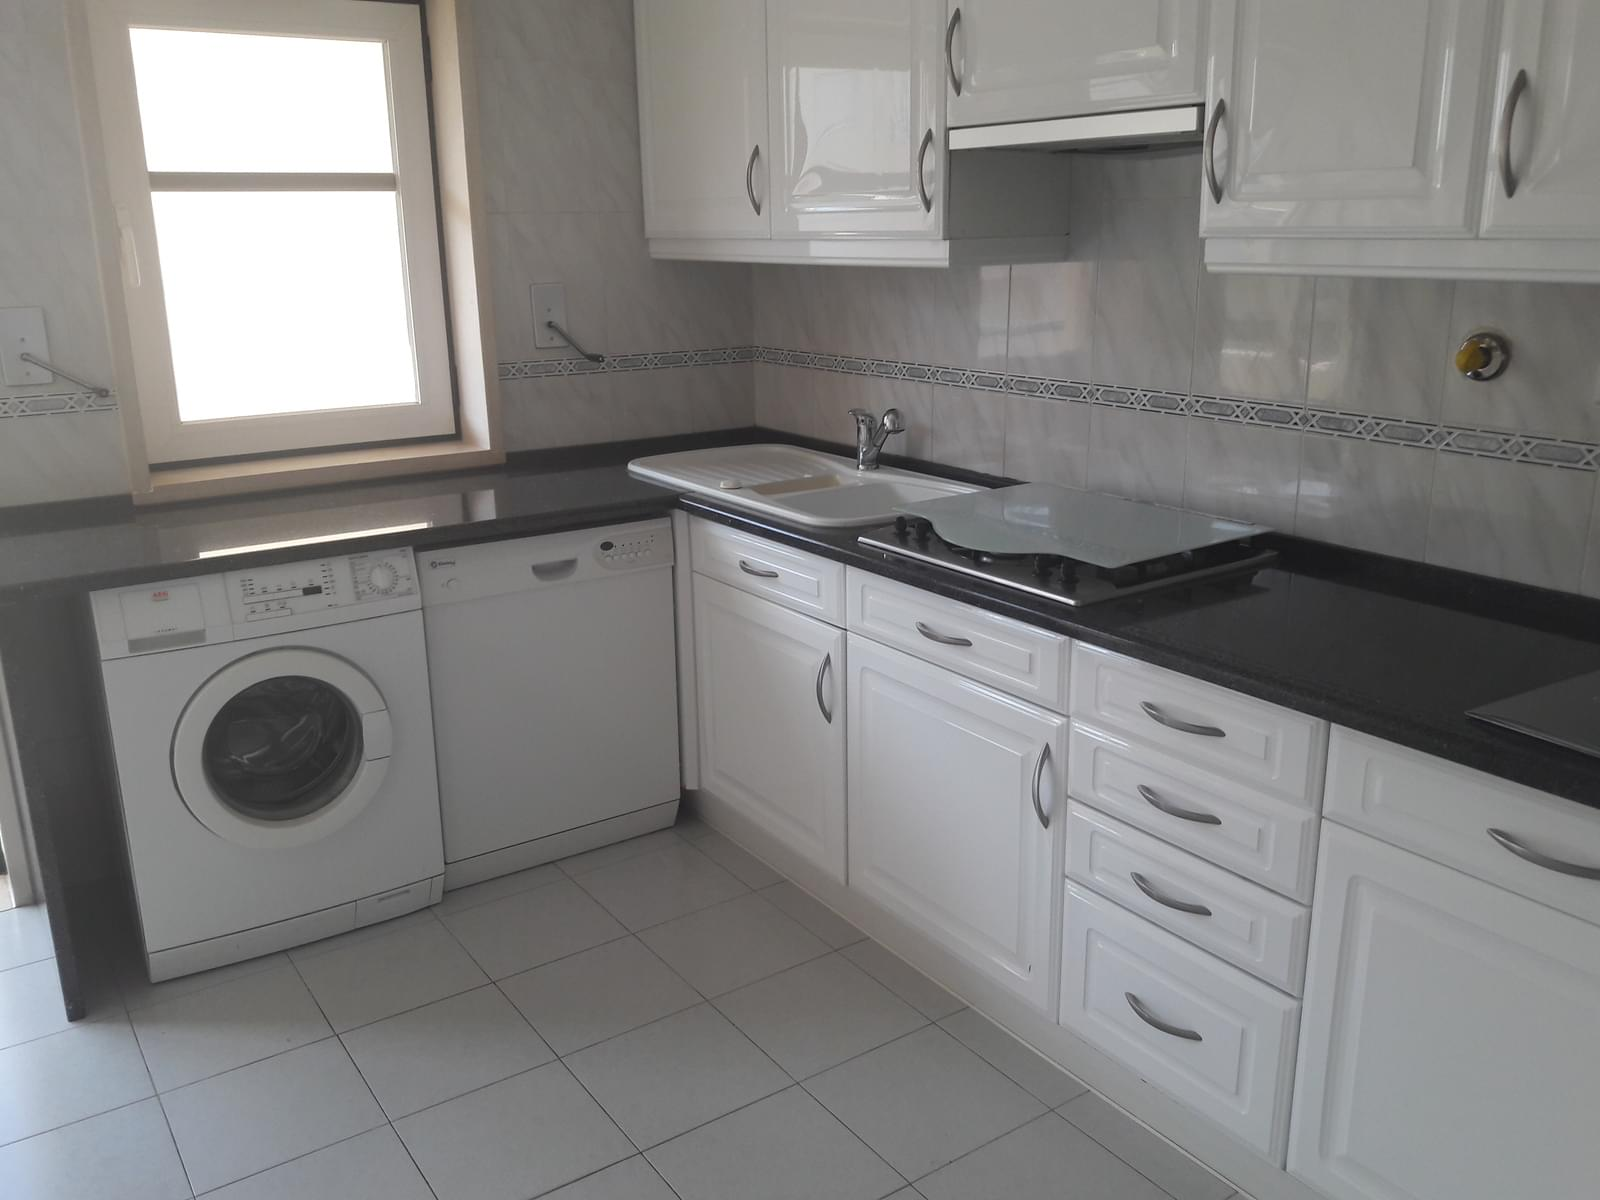 pf18038-apartamento-t3-827280ca-f738-417c-9f54-d645c2d8dee0